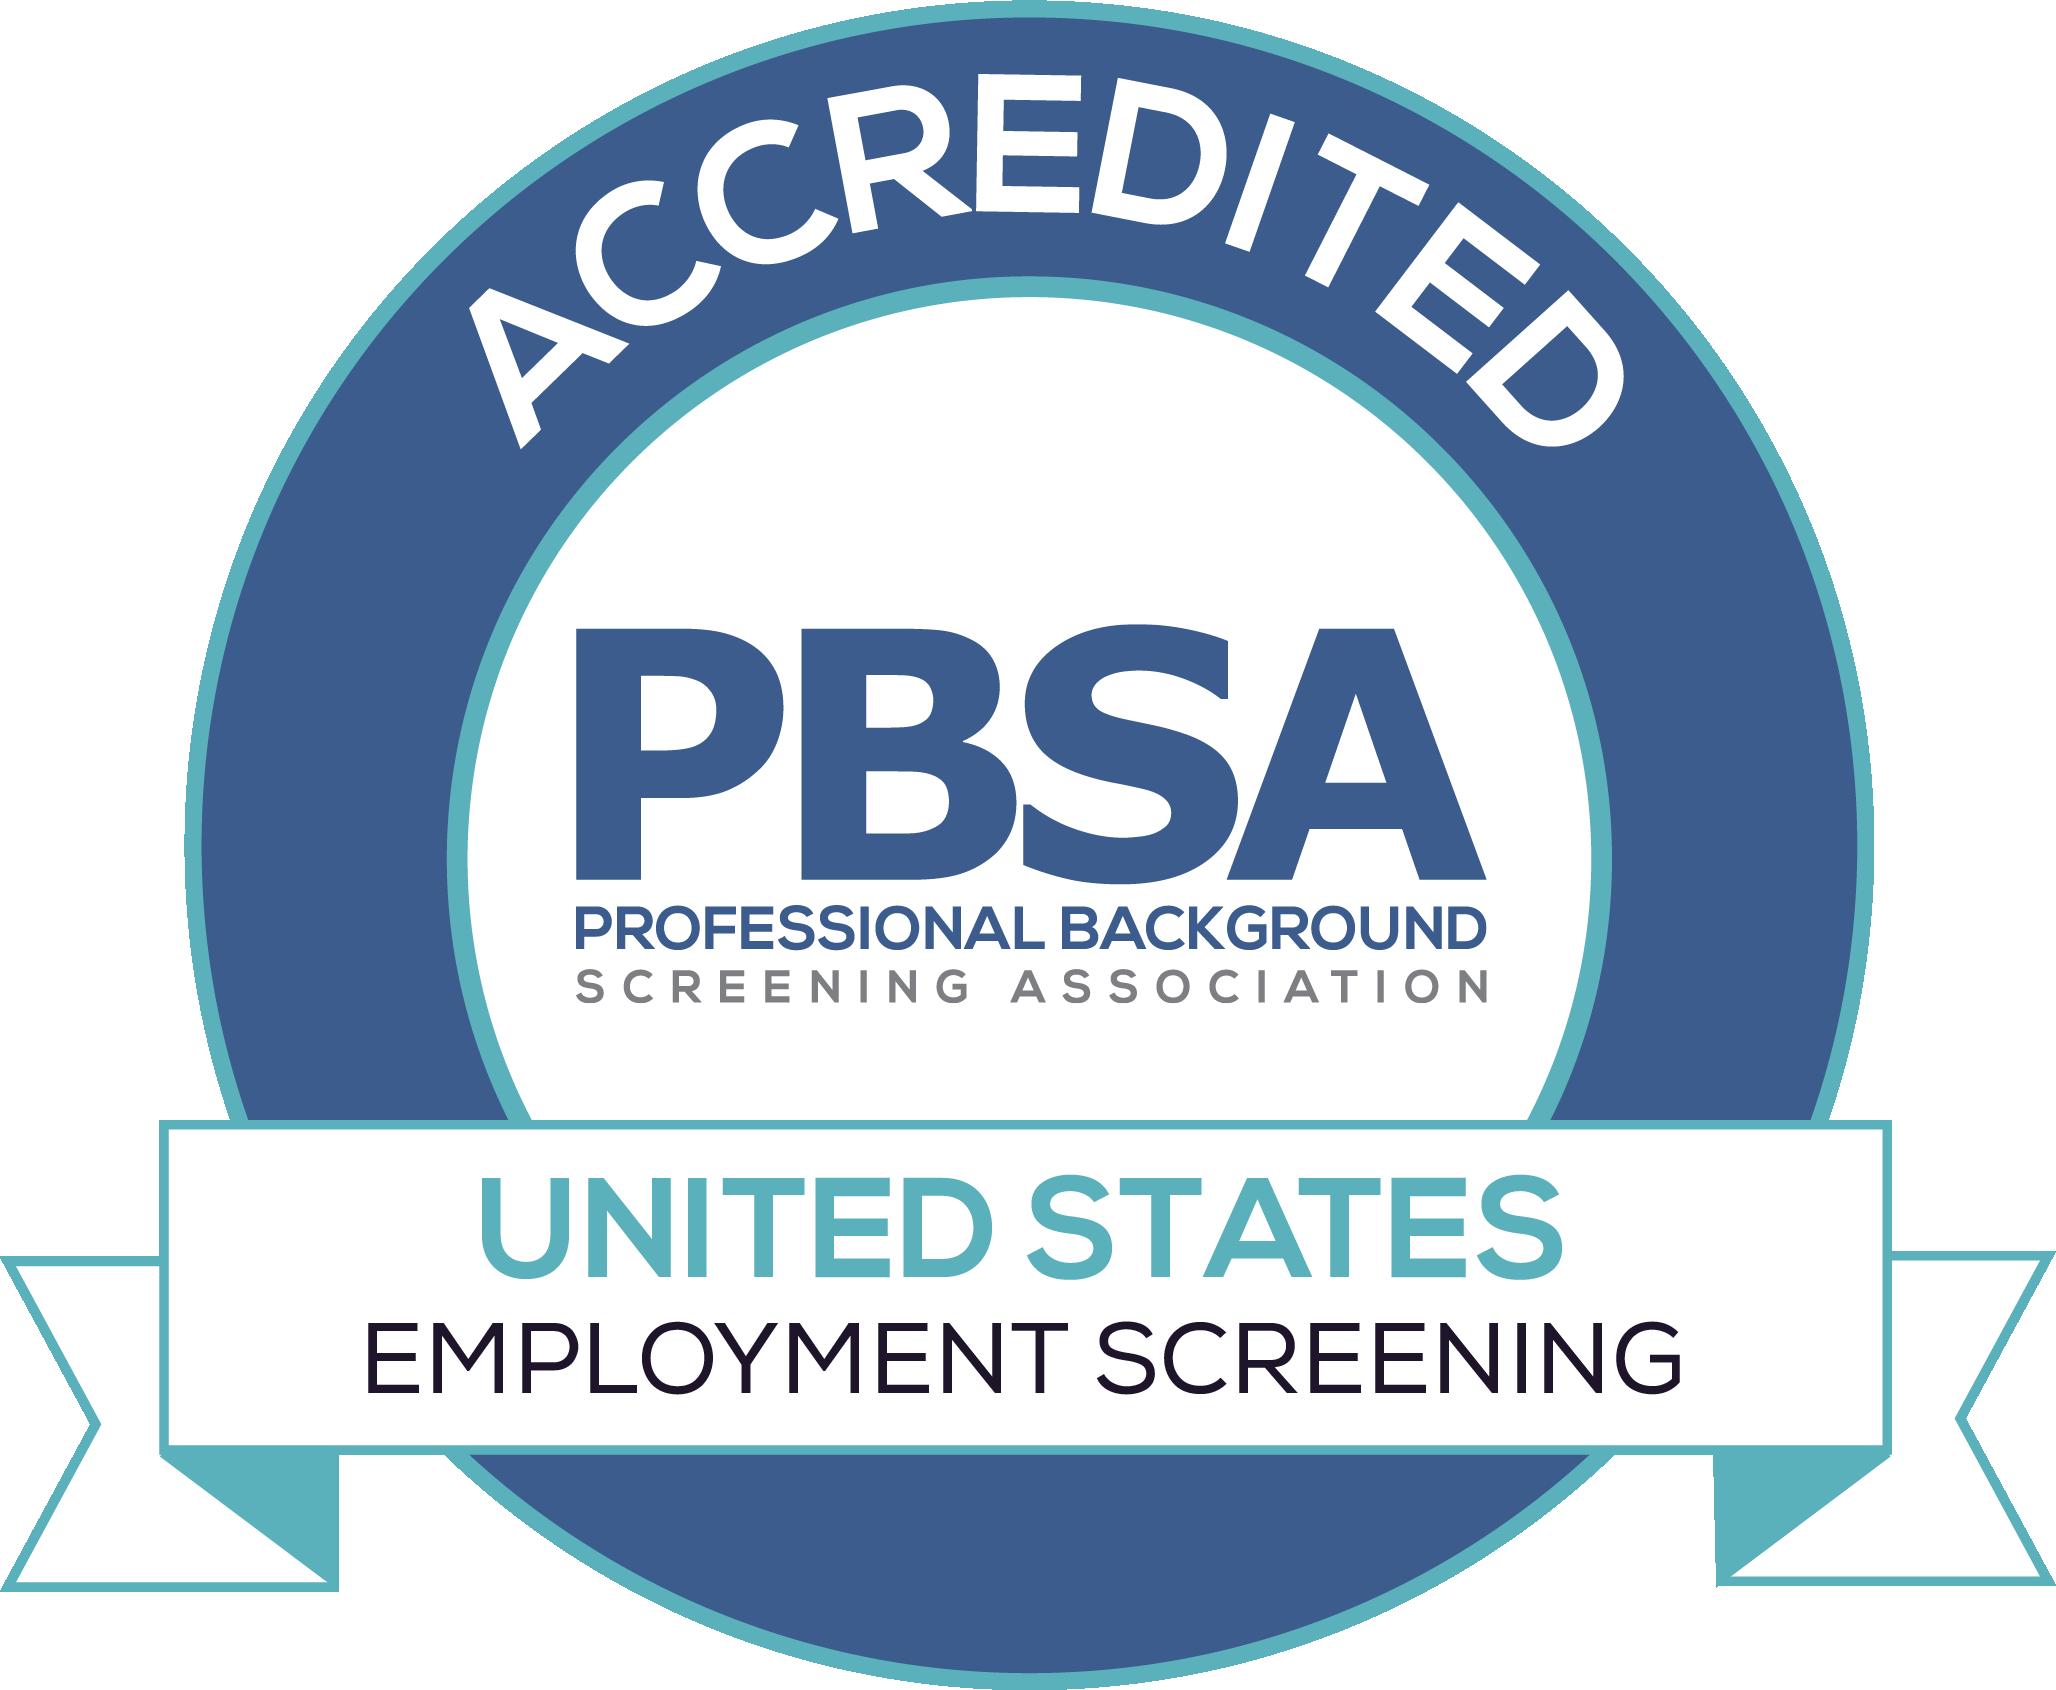 PBSA_Accreditation_Logo_Transparent.png